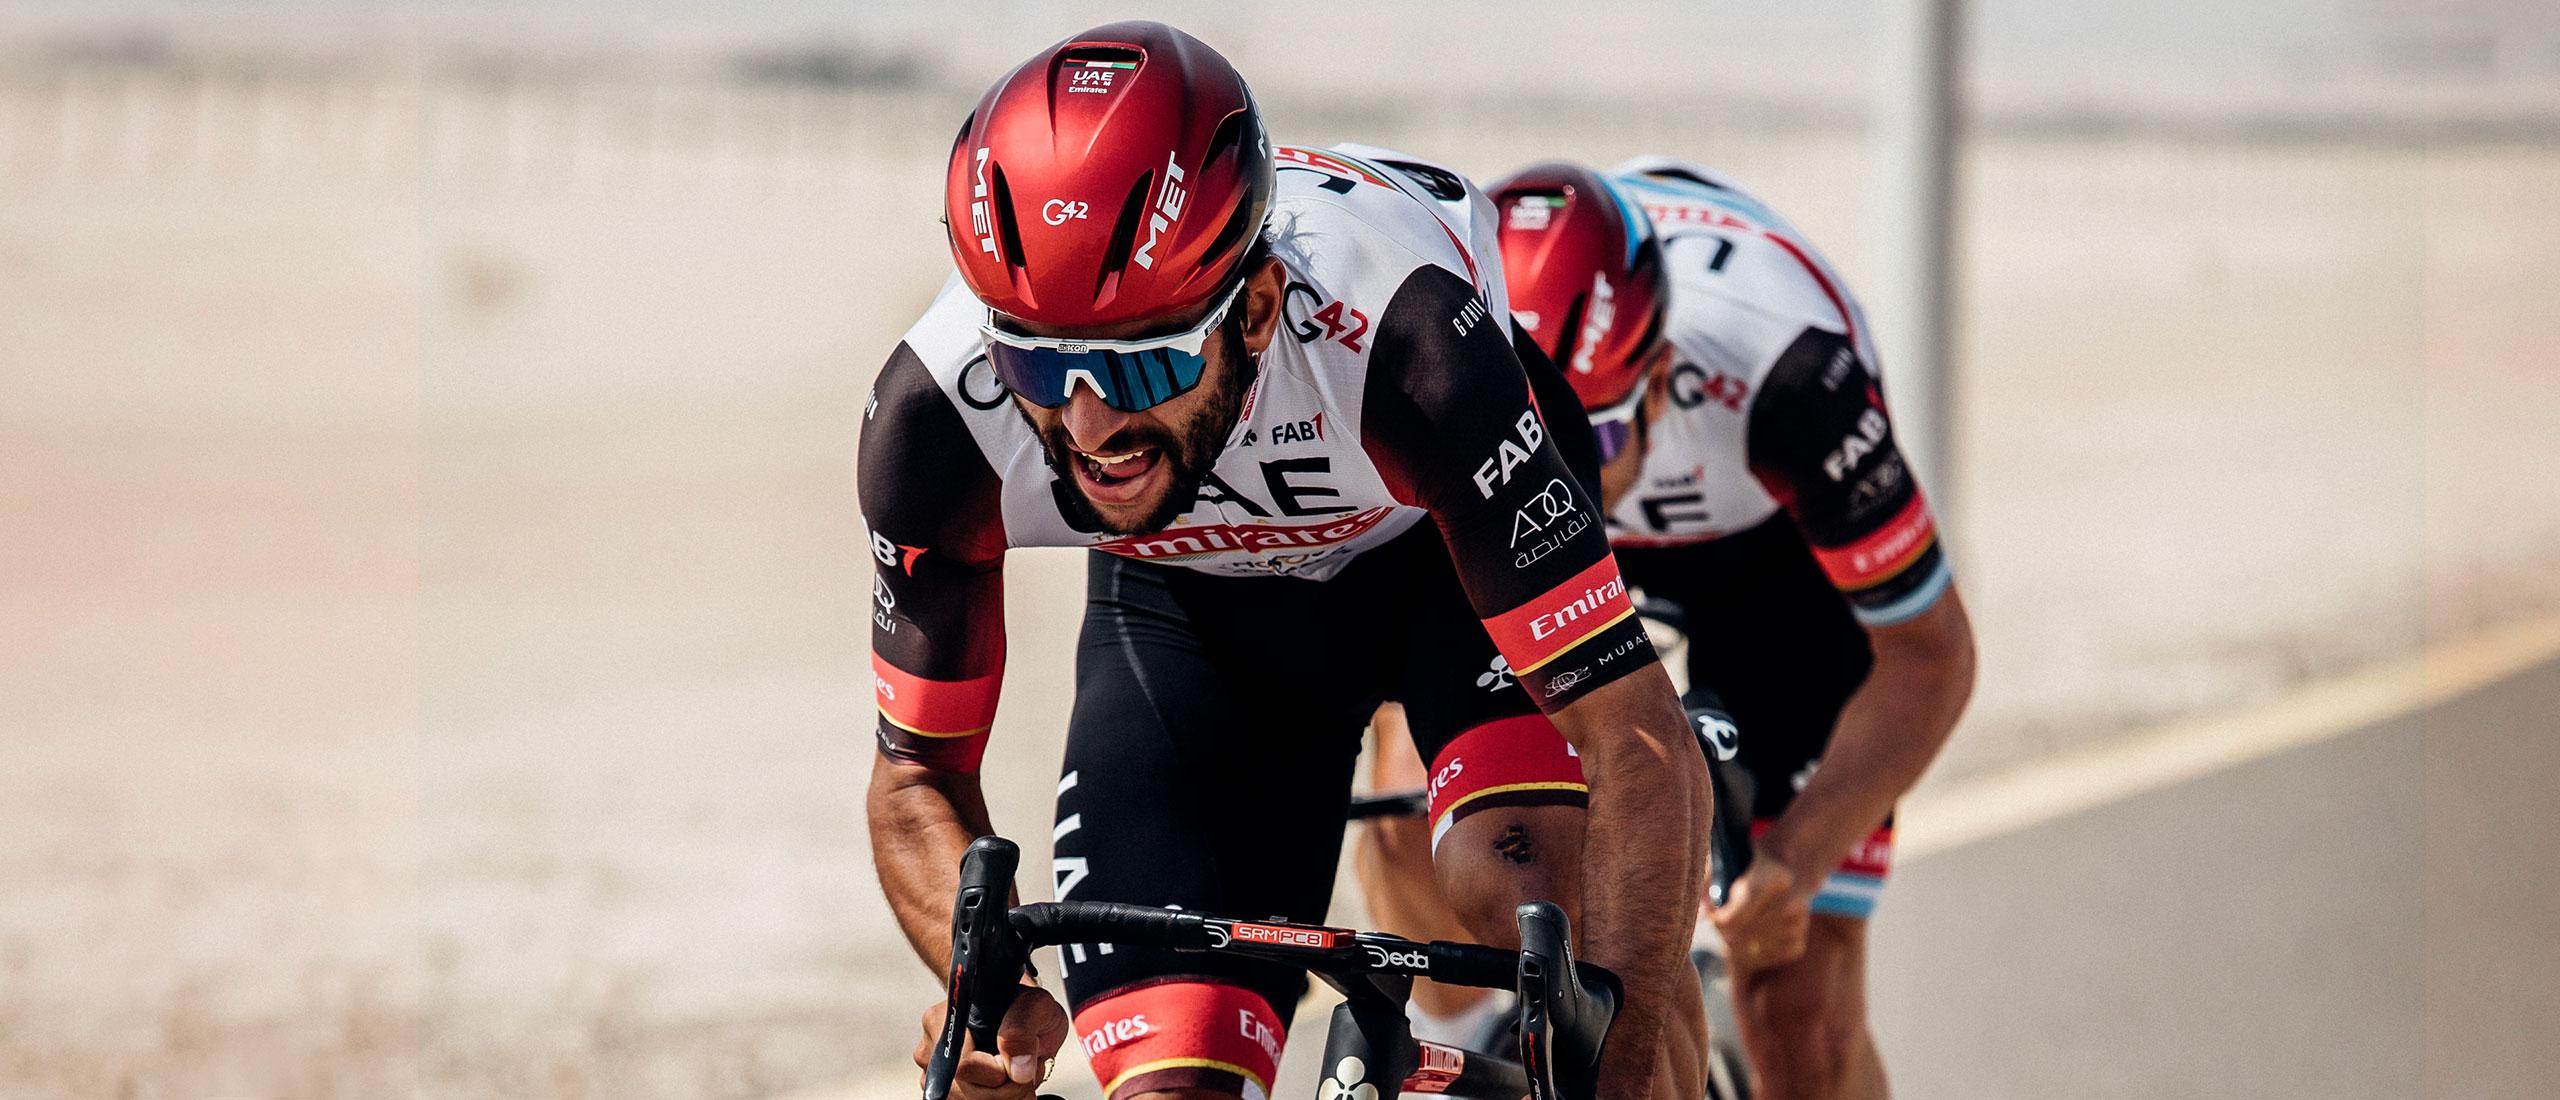 MET Manta Mips Road, Triathlon and Winter Rides Helmet: Fernando Gaviria (UAE Team Emirates)